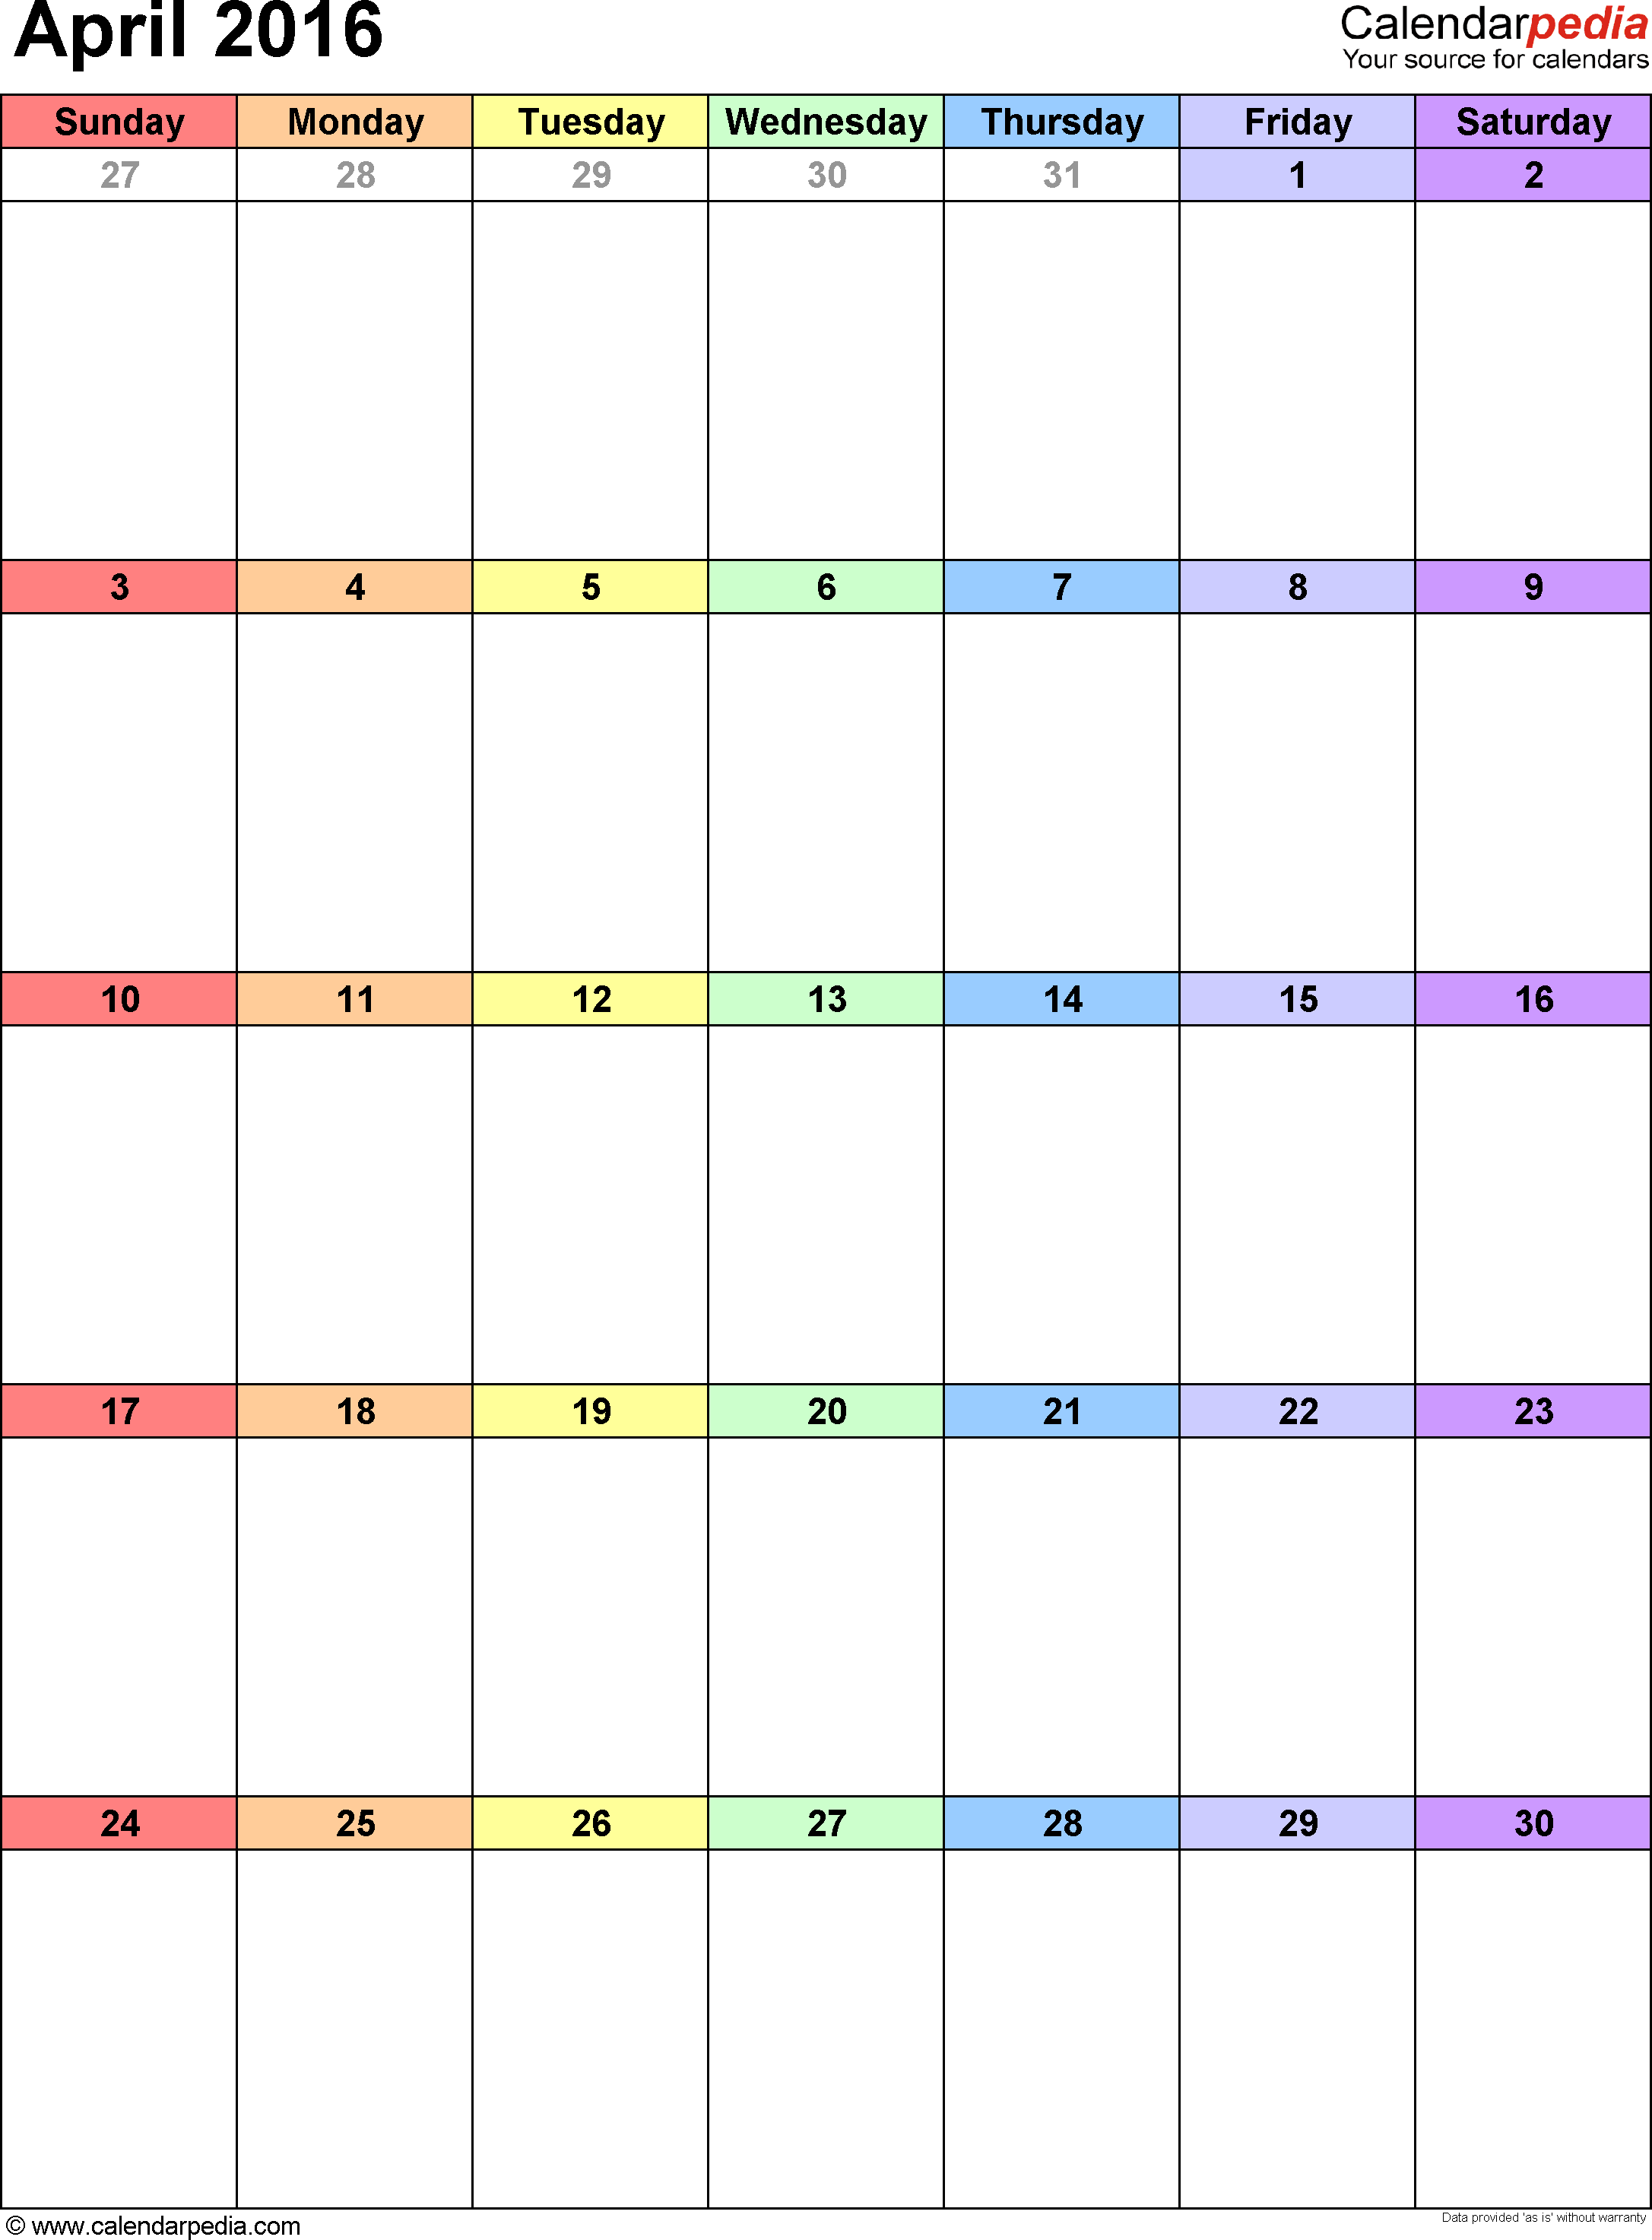 April 2016 Calendars for Word, Excel & PDF